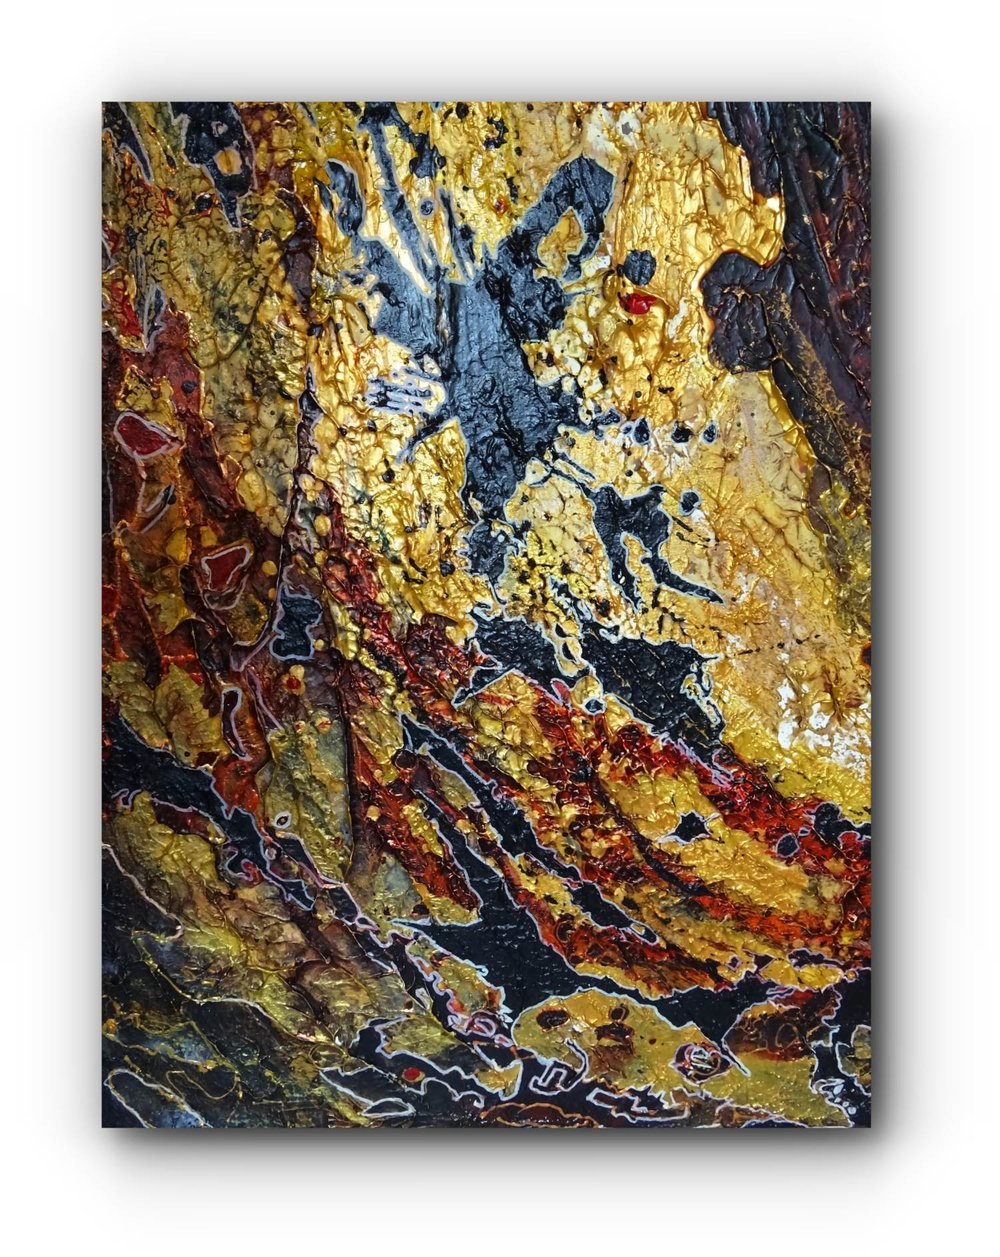 painting-detail-15-golden-sanctuary-artists-ingress-vortices.jpg